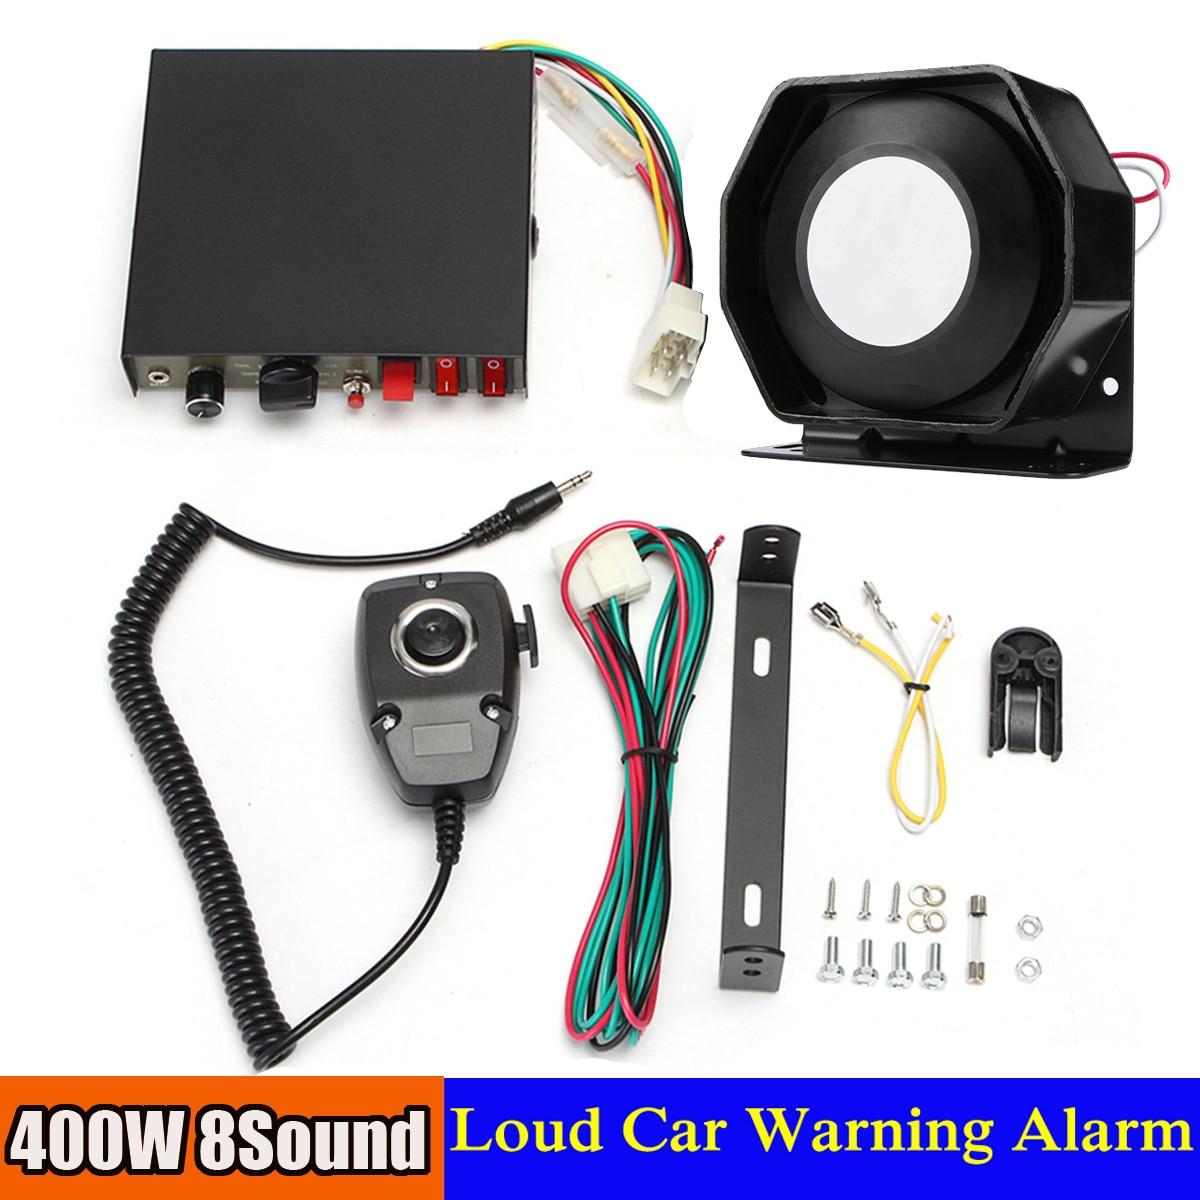 400W 8 Sound Loud Car Warning Alarm P olice Fire S iren Horn PA Speaker MIC System